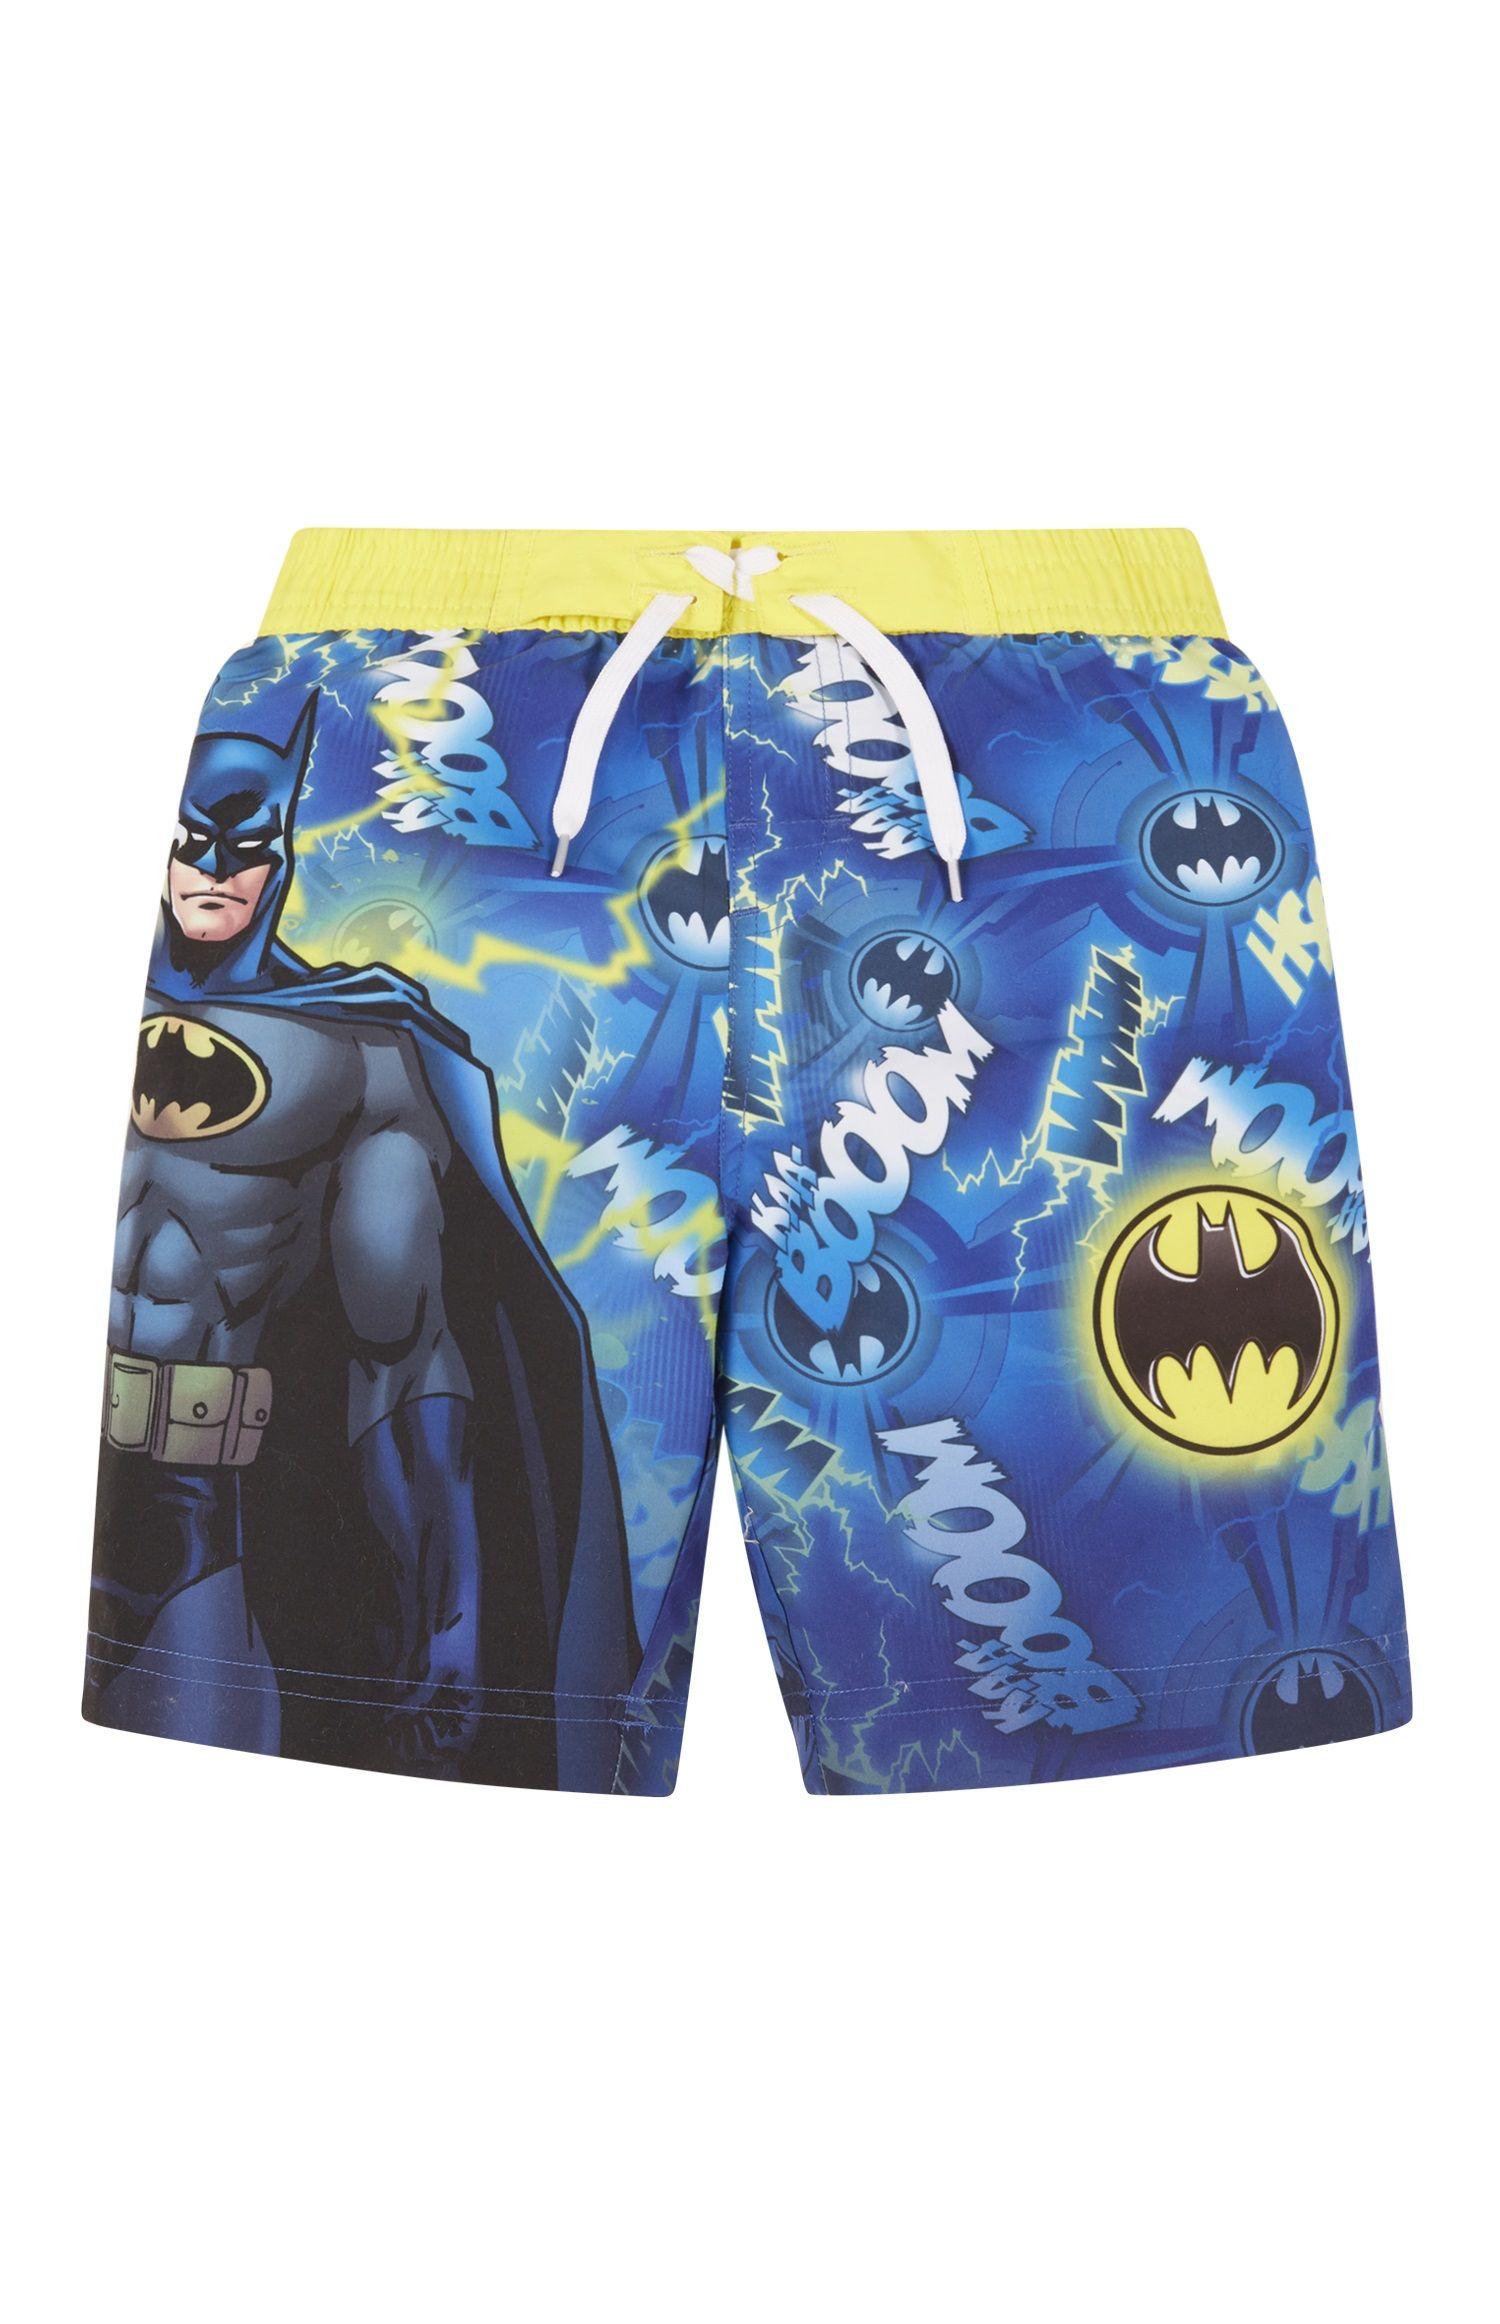 1bb2f2831c Primark - Older Boys Batman Swim Shorts | Licensed Products ...